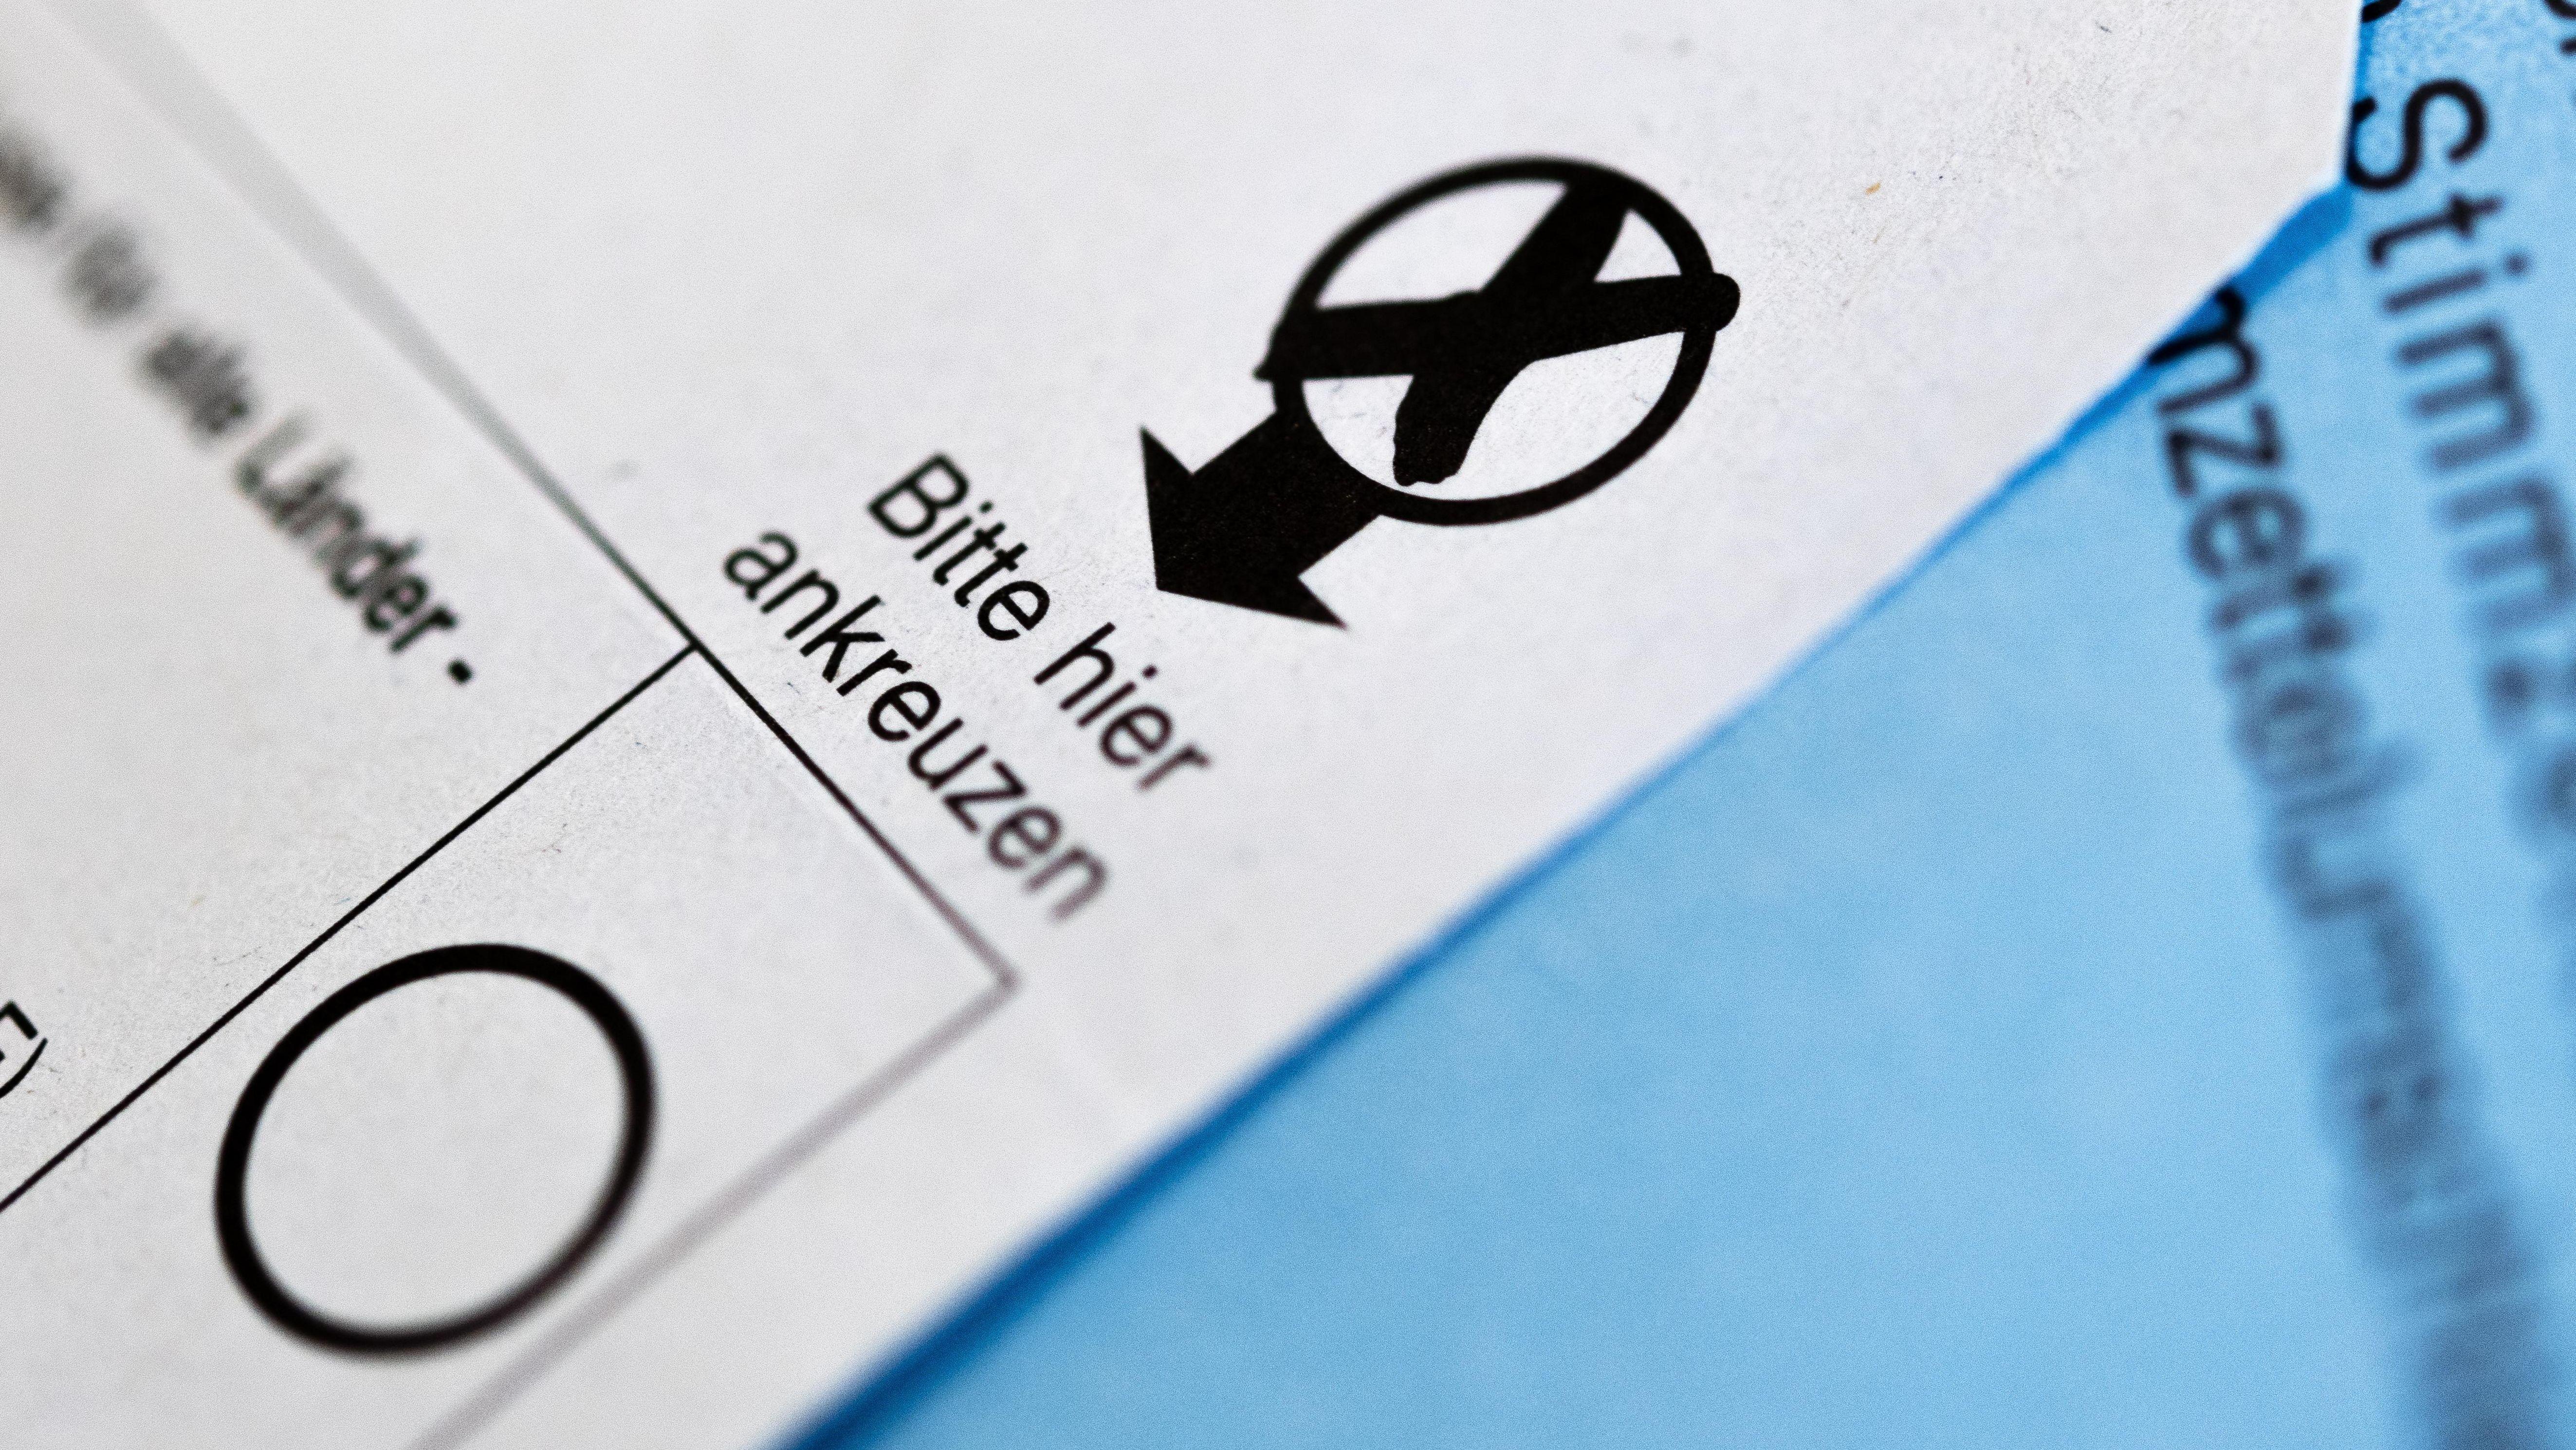 Stimmzettel (Symbolbild)